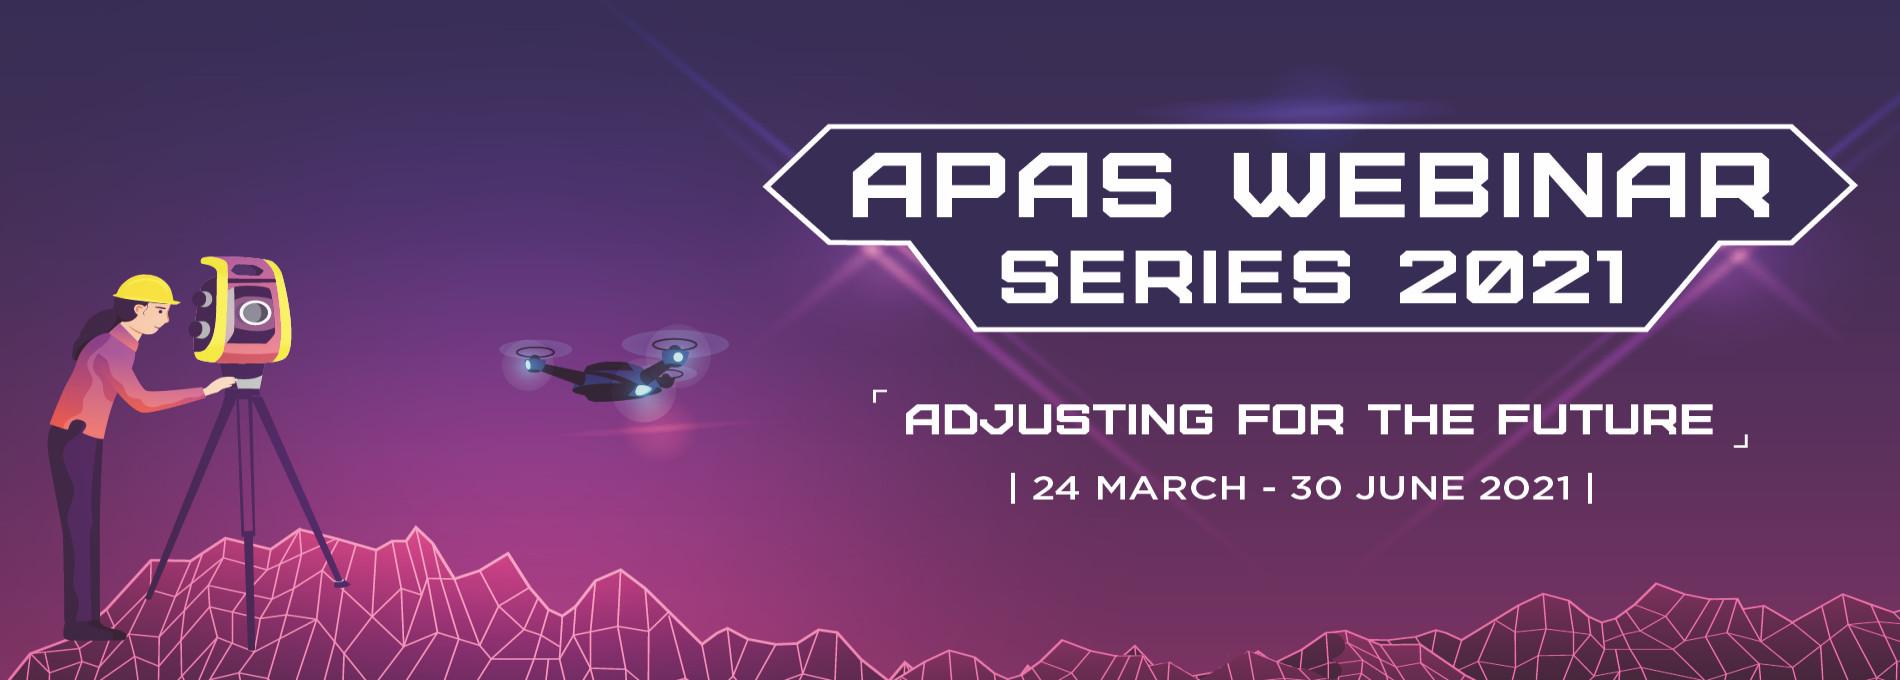 APAS2021 Webinar Series